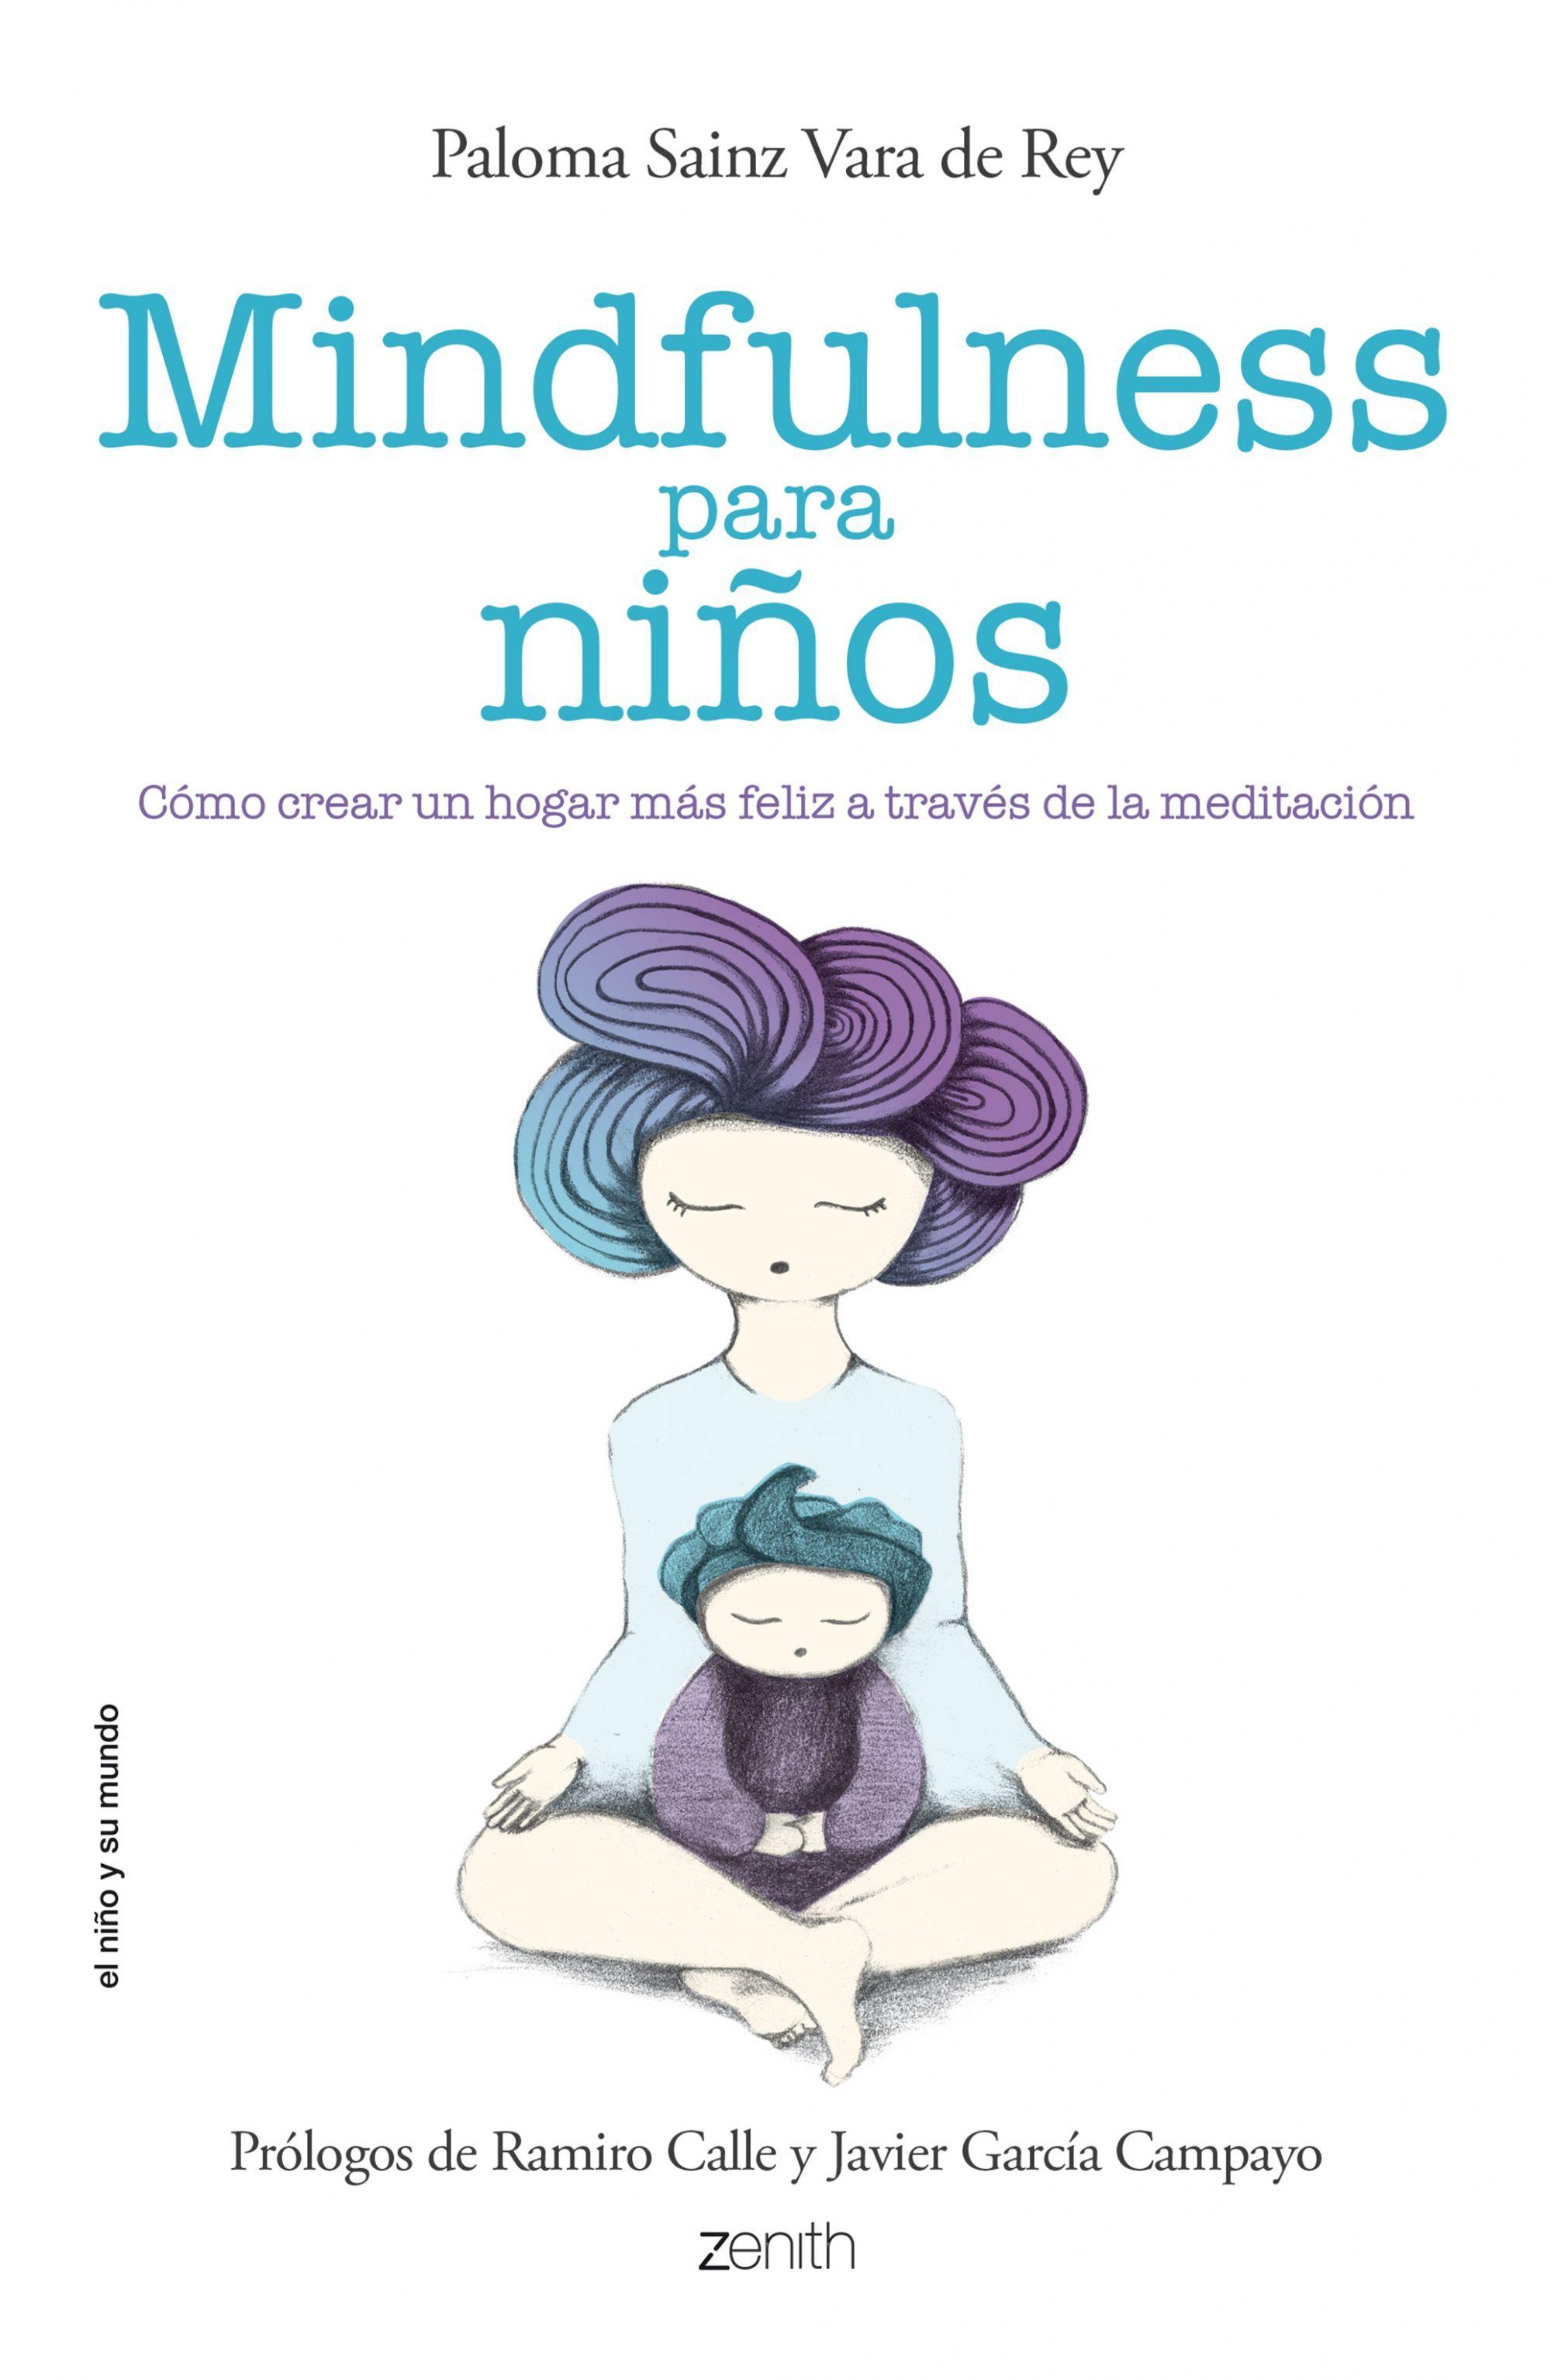 53 Ideas De Tesis Relajacion Para Niños Meditacion Para Niños Mindfulness